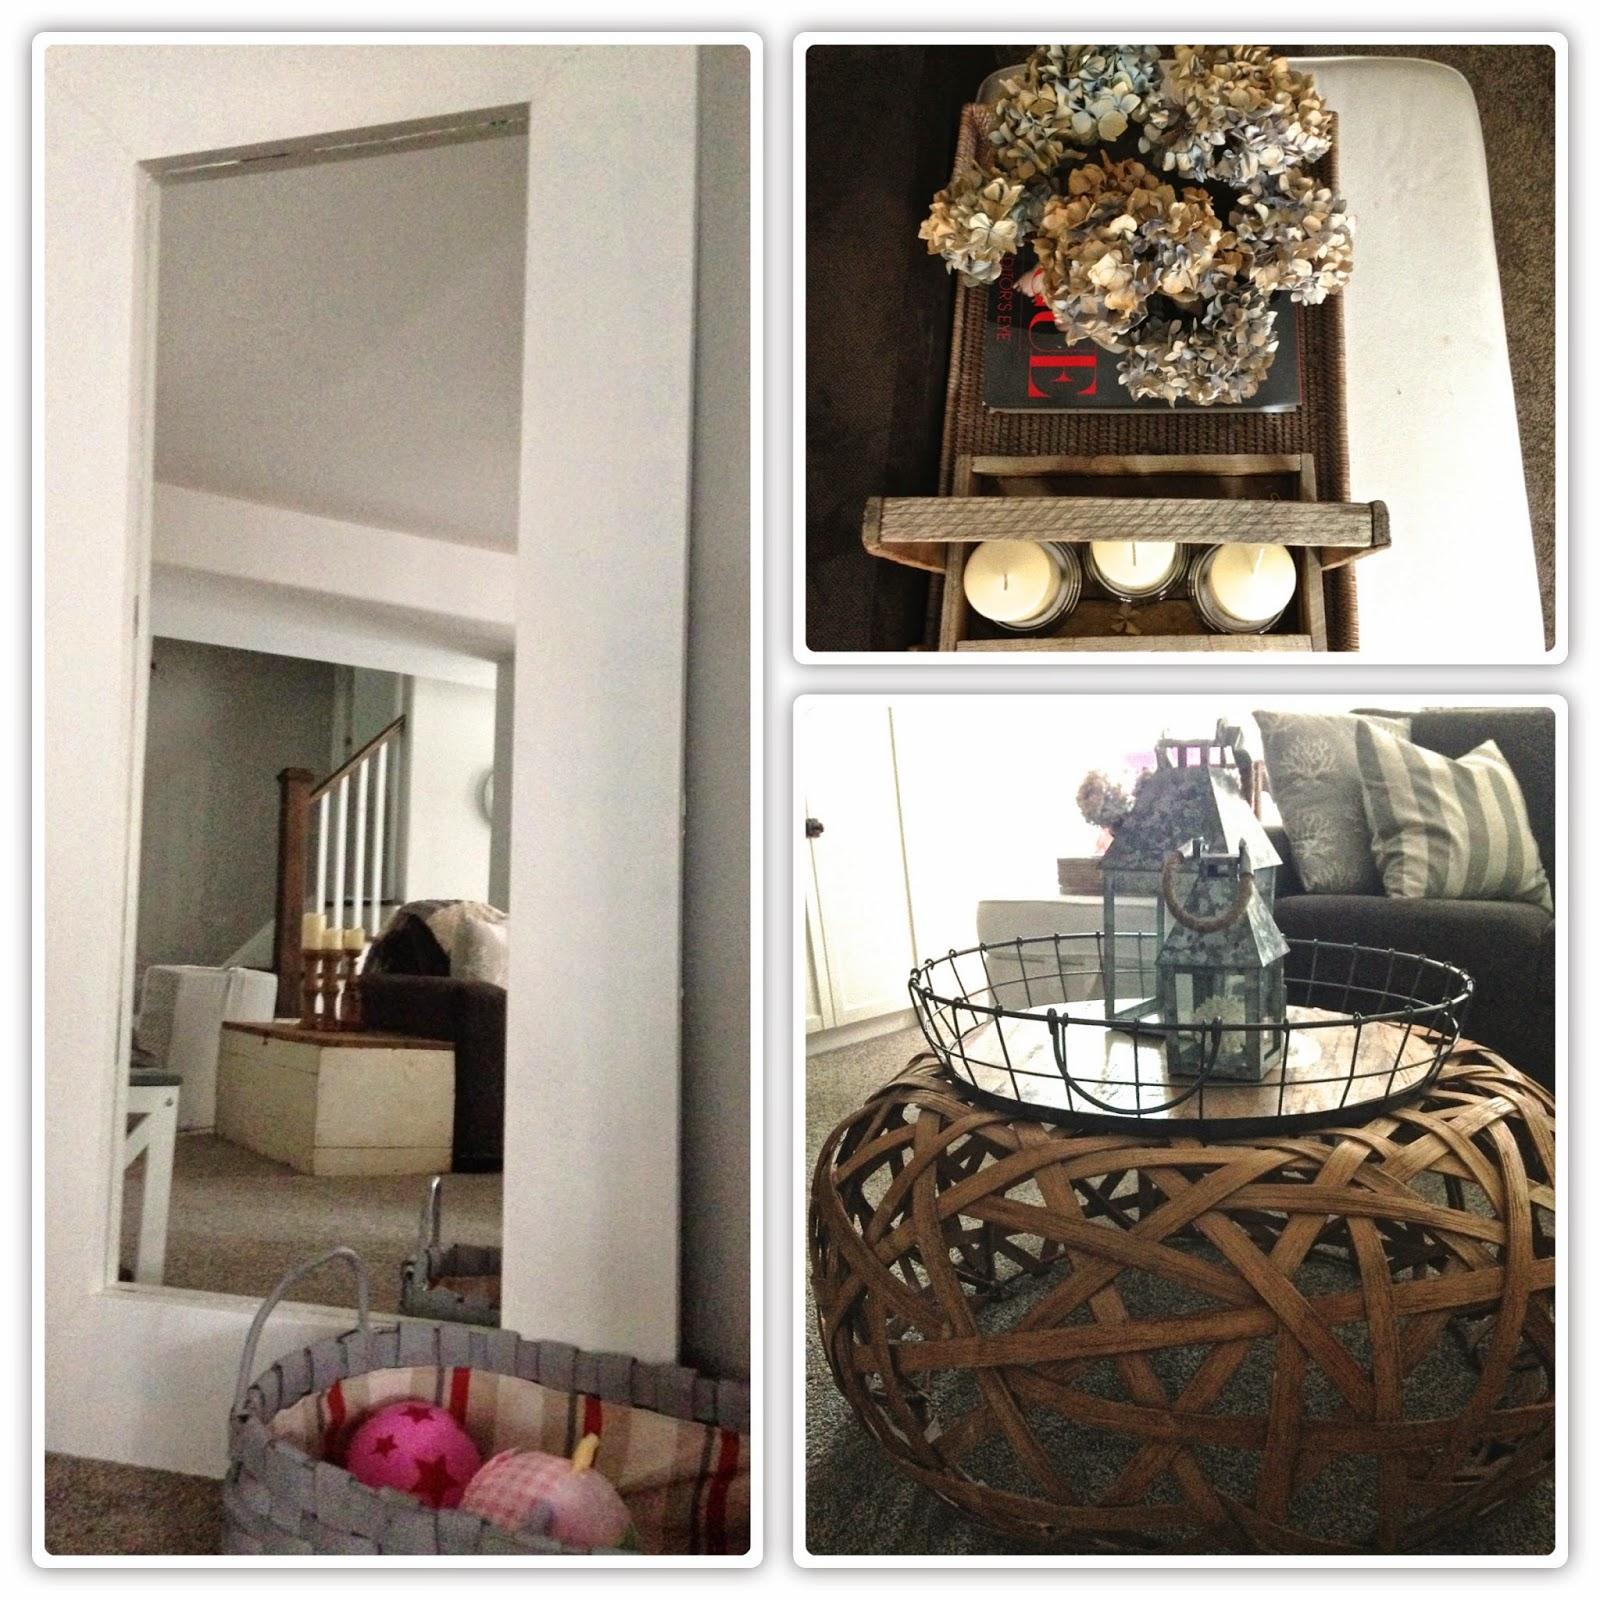 Ikea Mongstad Mirror 2perfection Decor Basement Family Room Reveal